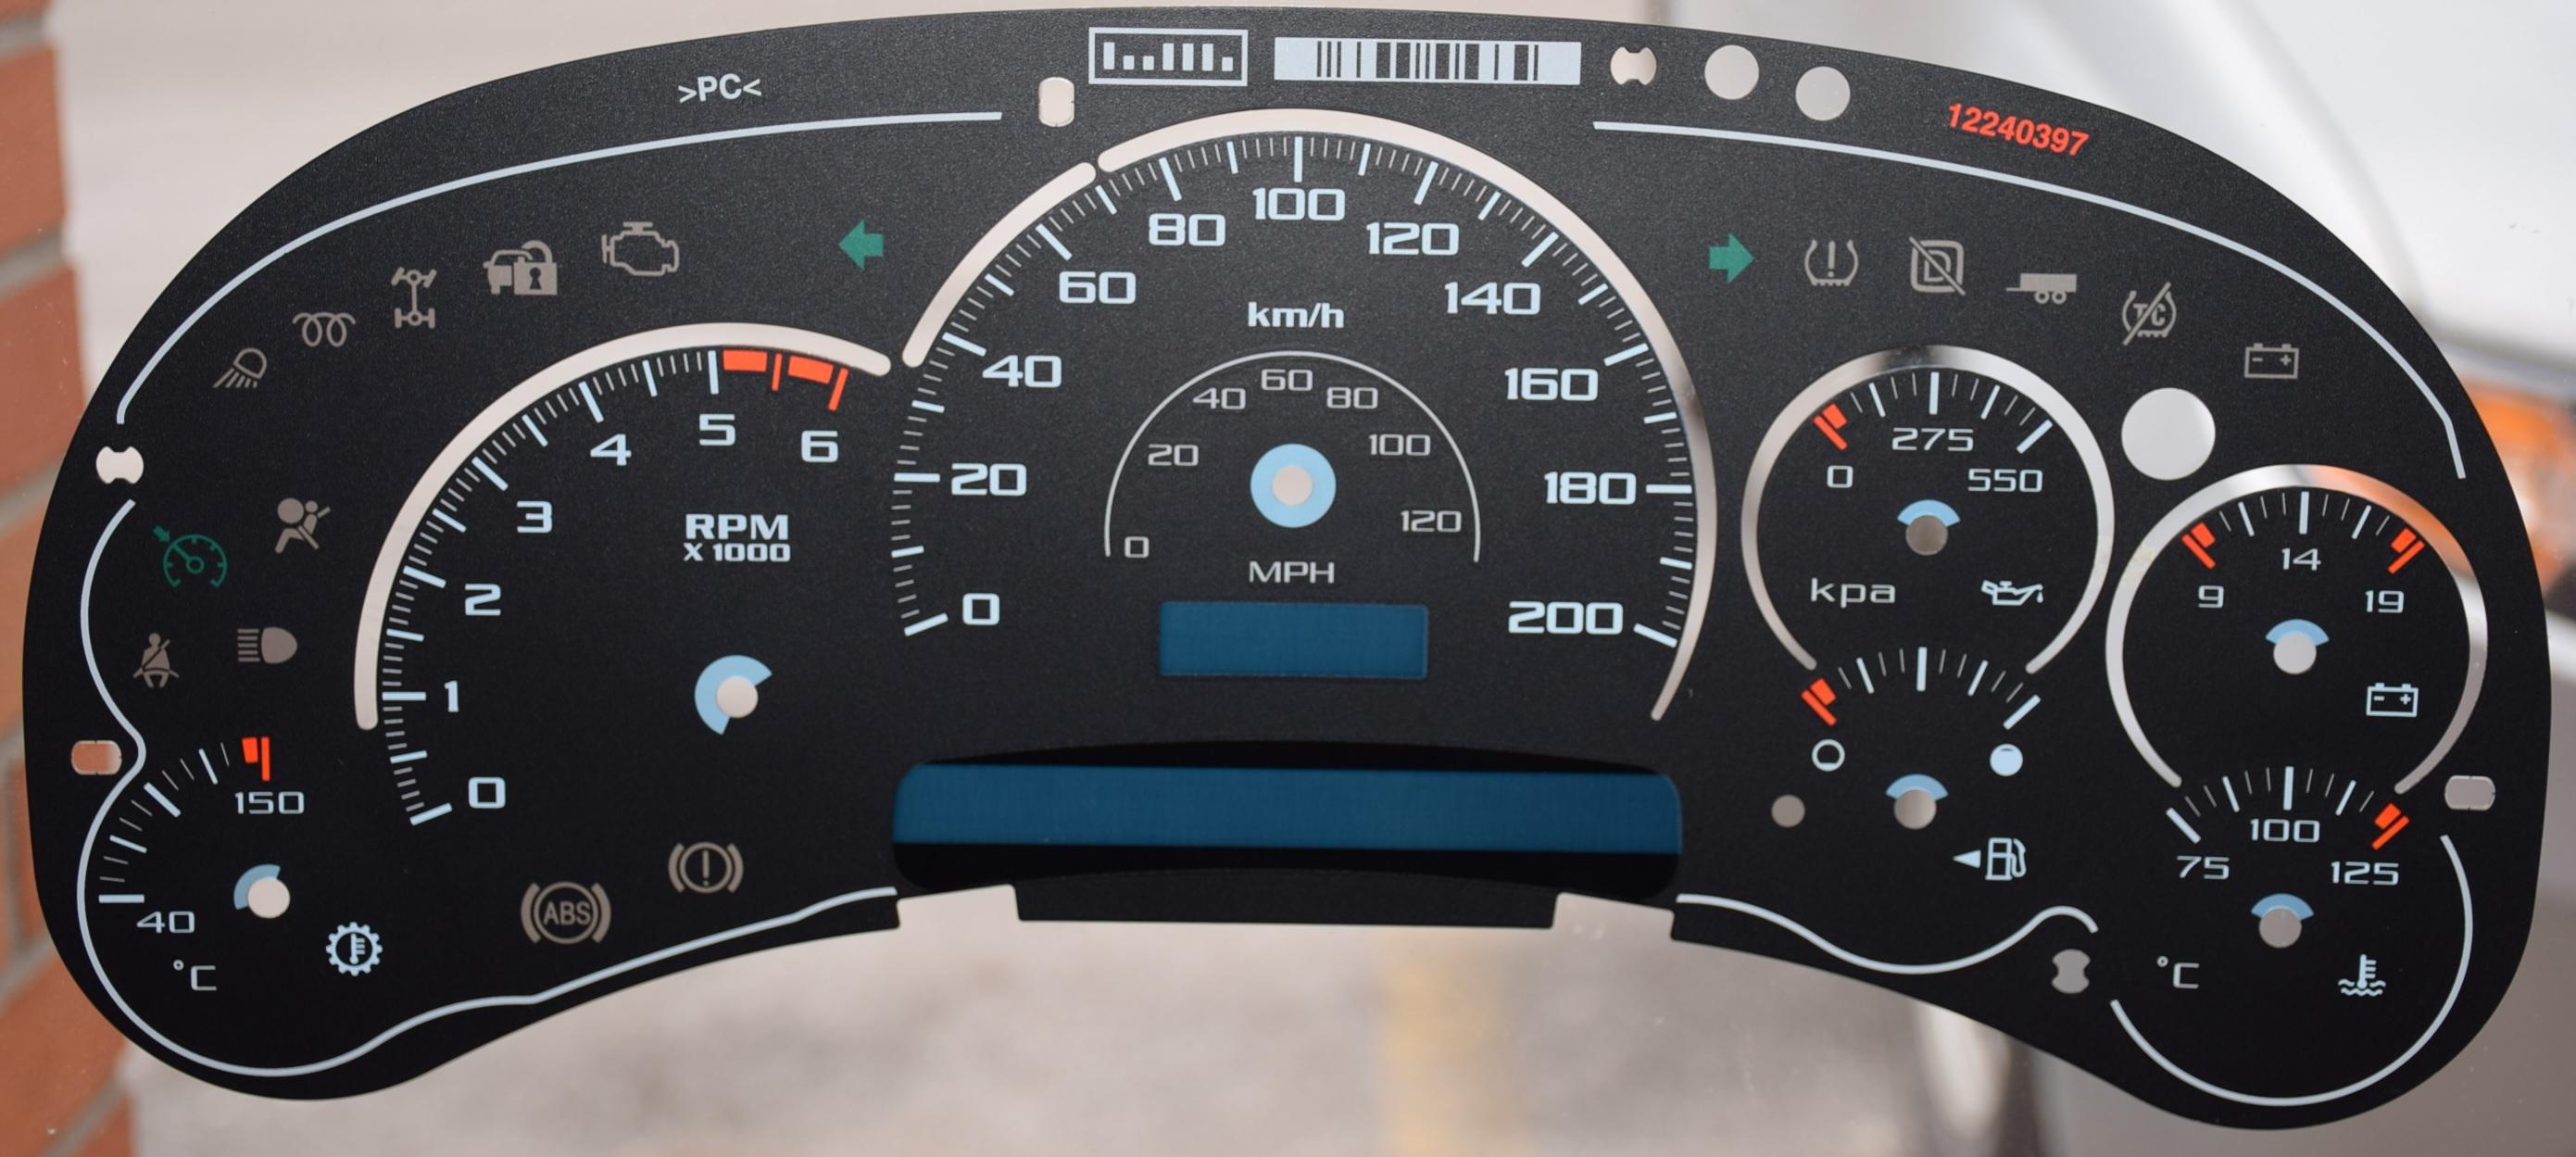 2004 GMC Sierra 2500 Speedometer Instrument Gauge Cluster IPC Repair Rebuild